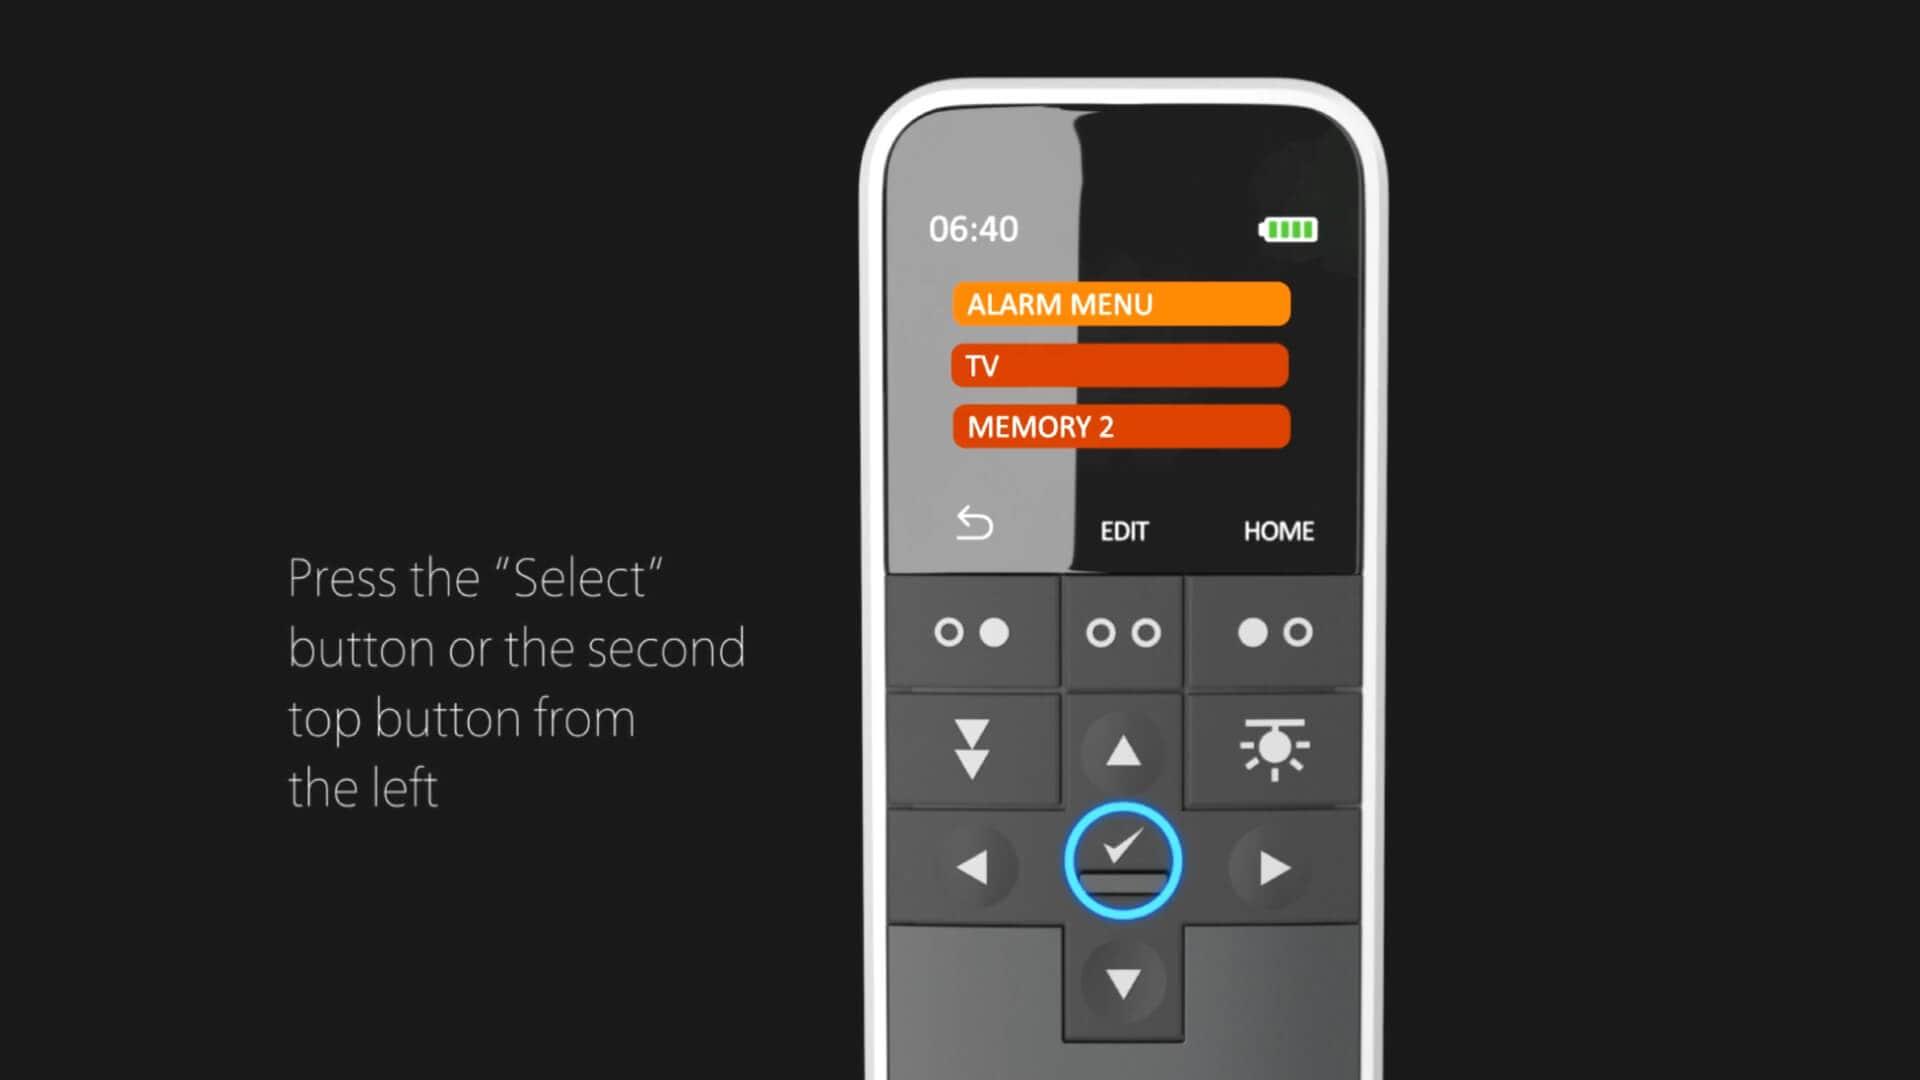 HC40 Come salvare le scelte rapide sul display